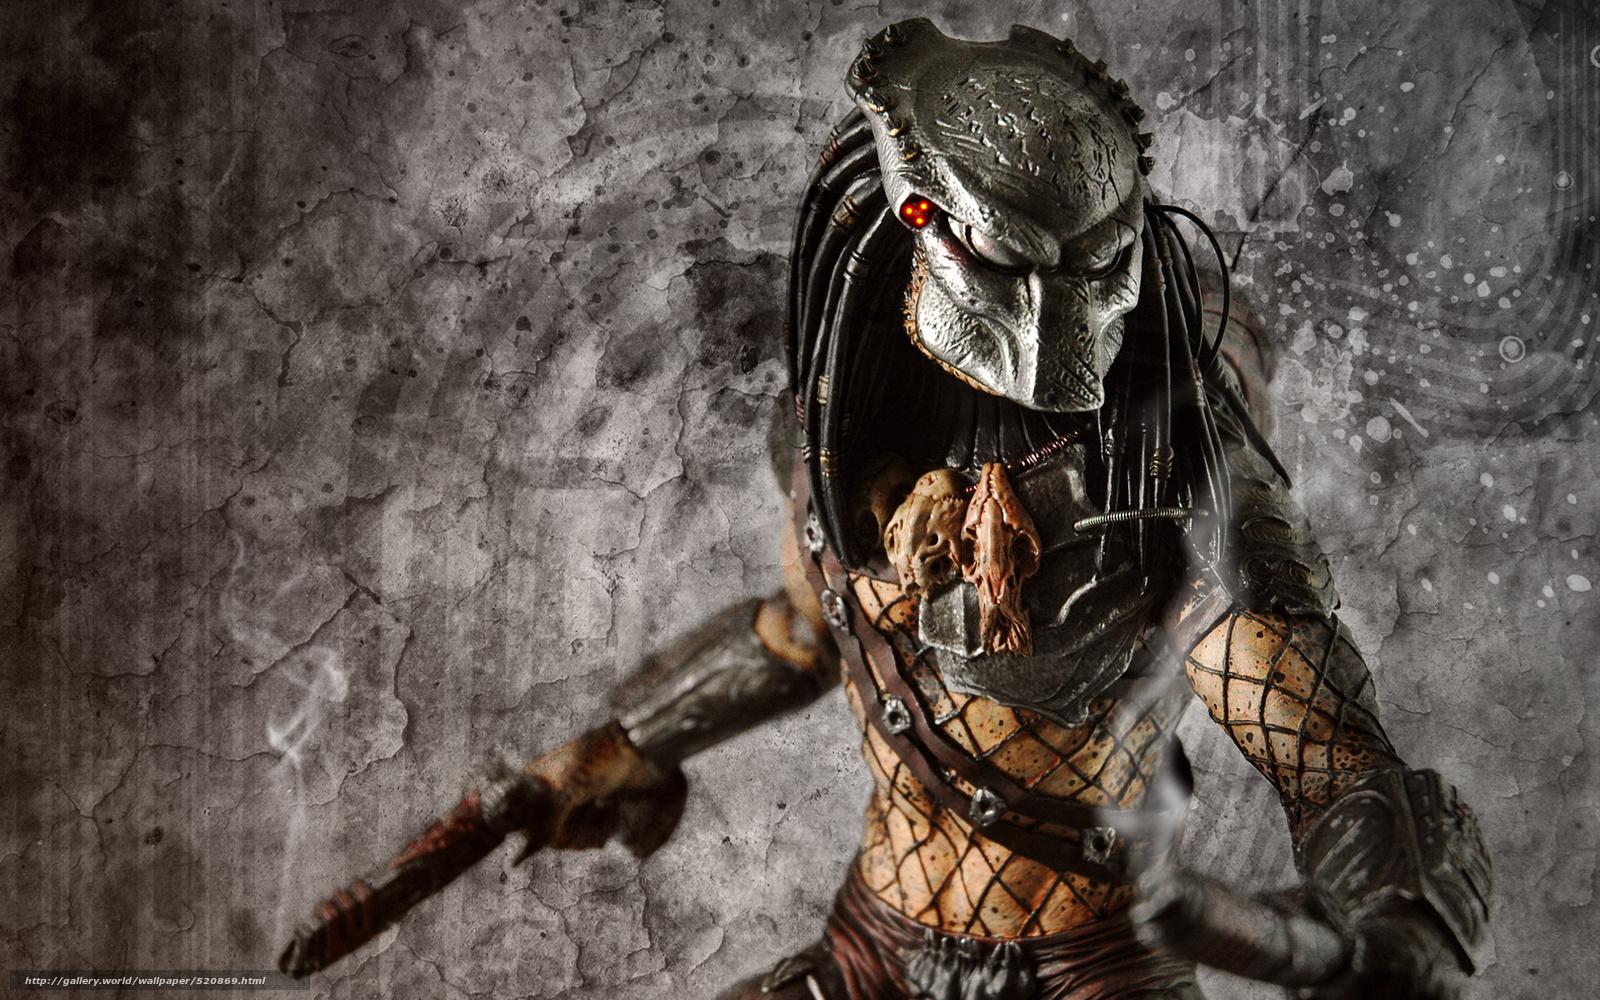 520869_ubijca_xishhnik_1920x1200_(www.GdeFon.ru) The Predator